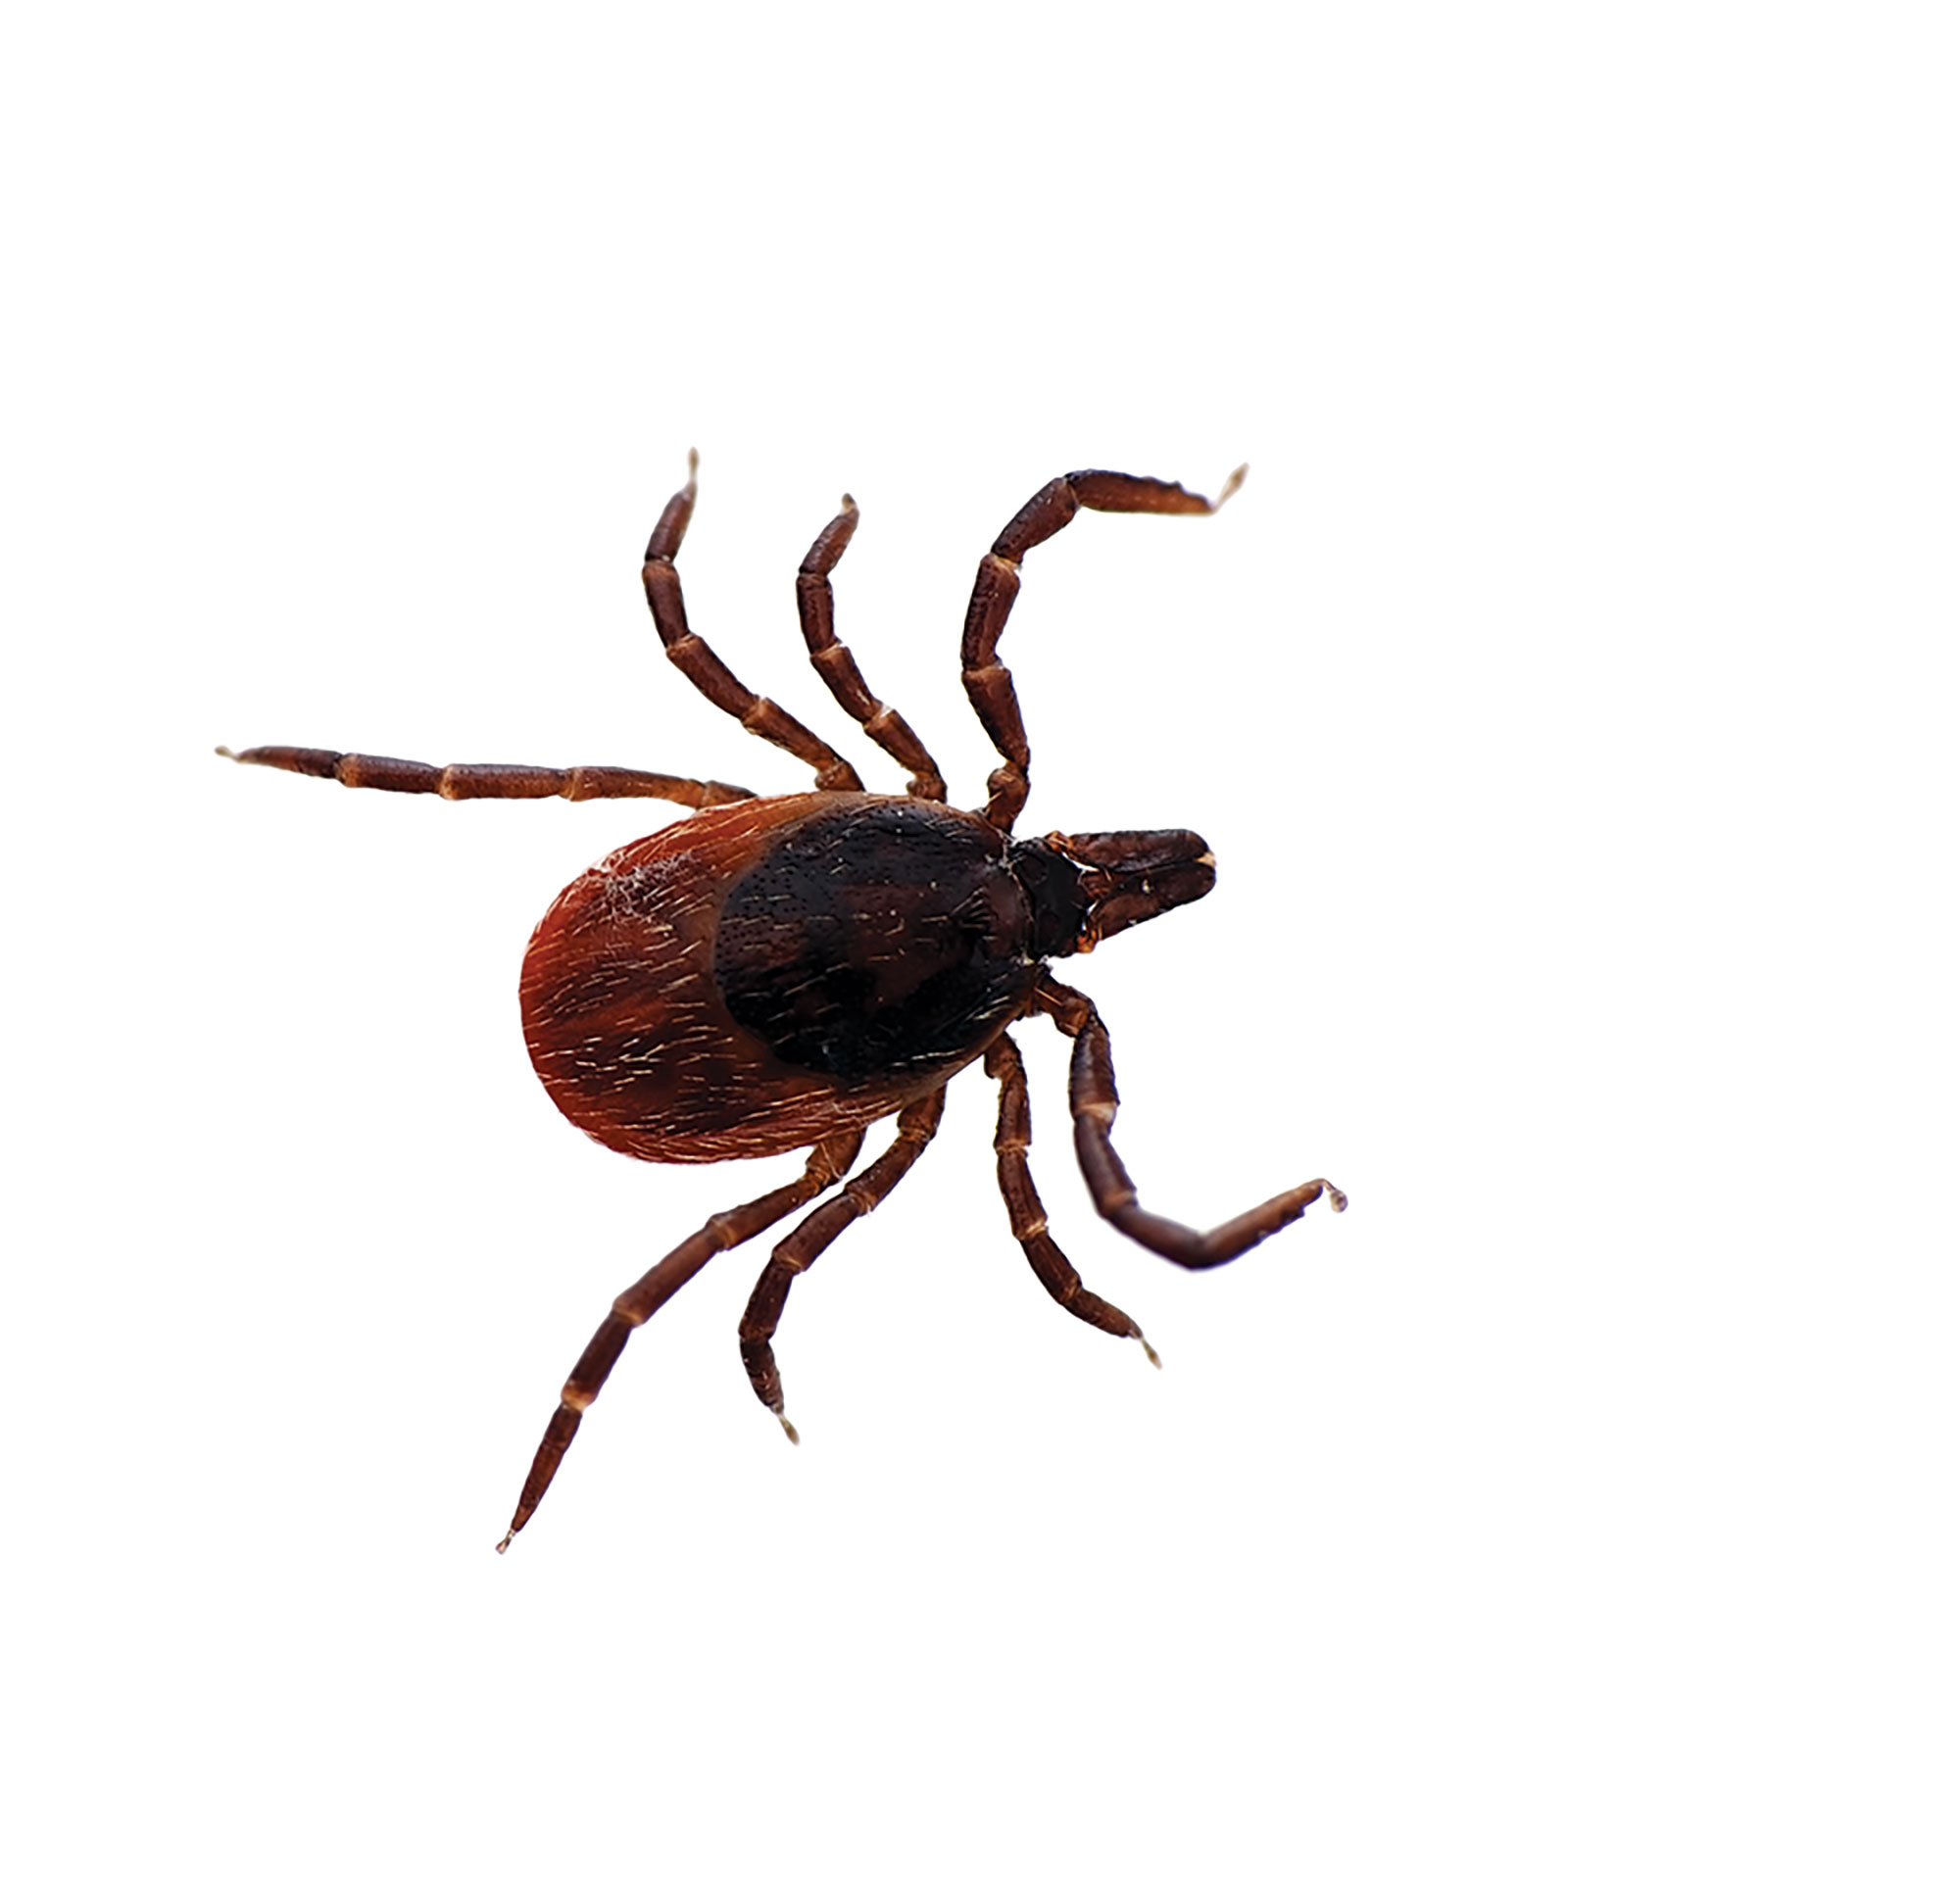 Lyme disease tests on the horizon